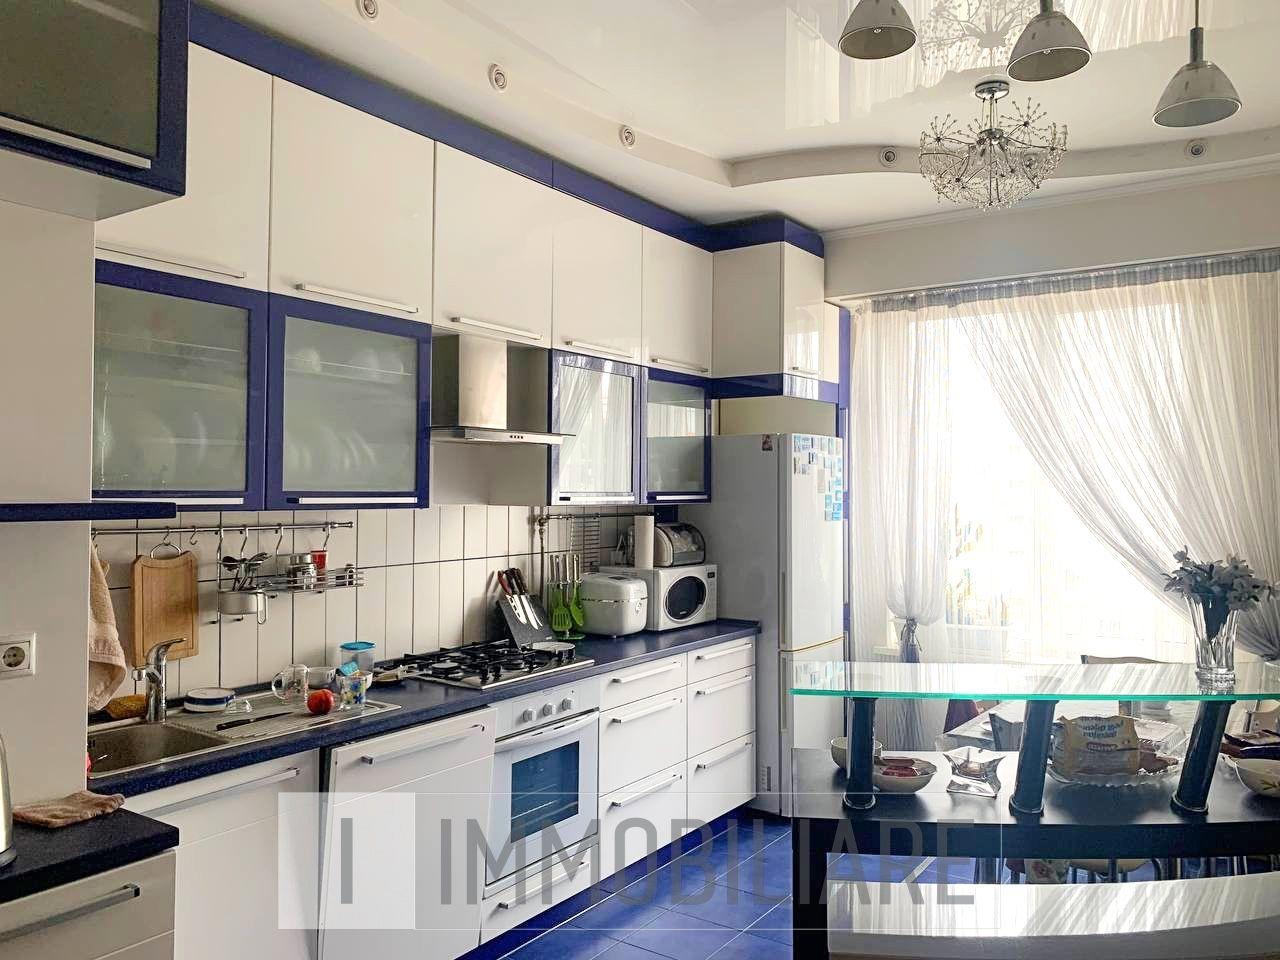 Apartament cu 2 camere+living, sect. Centru, str. Petru Rareș.